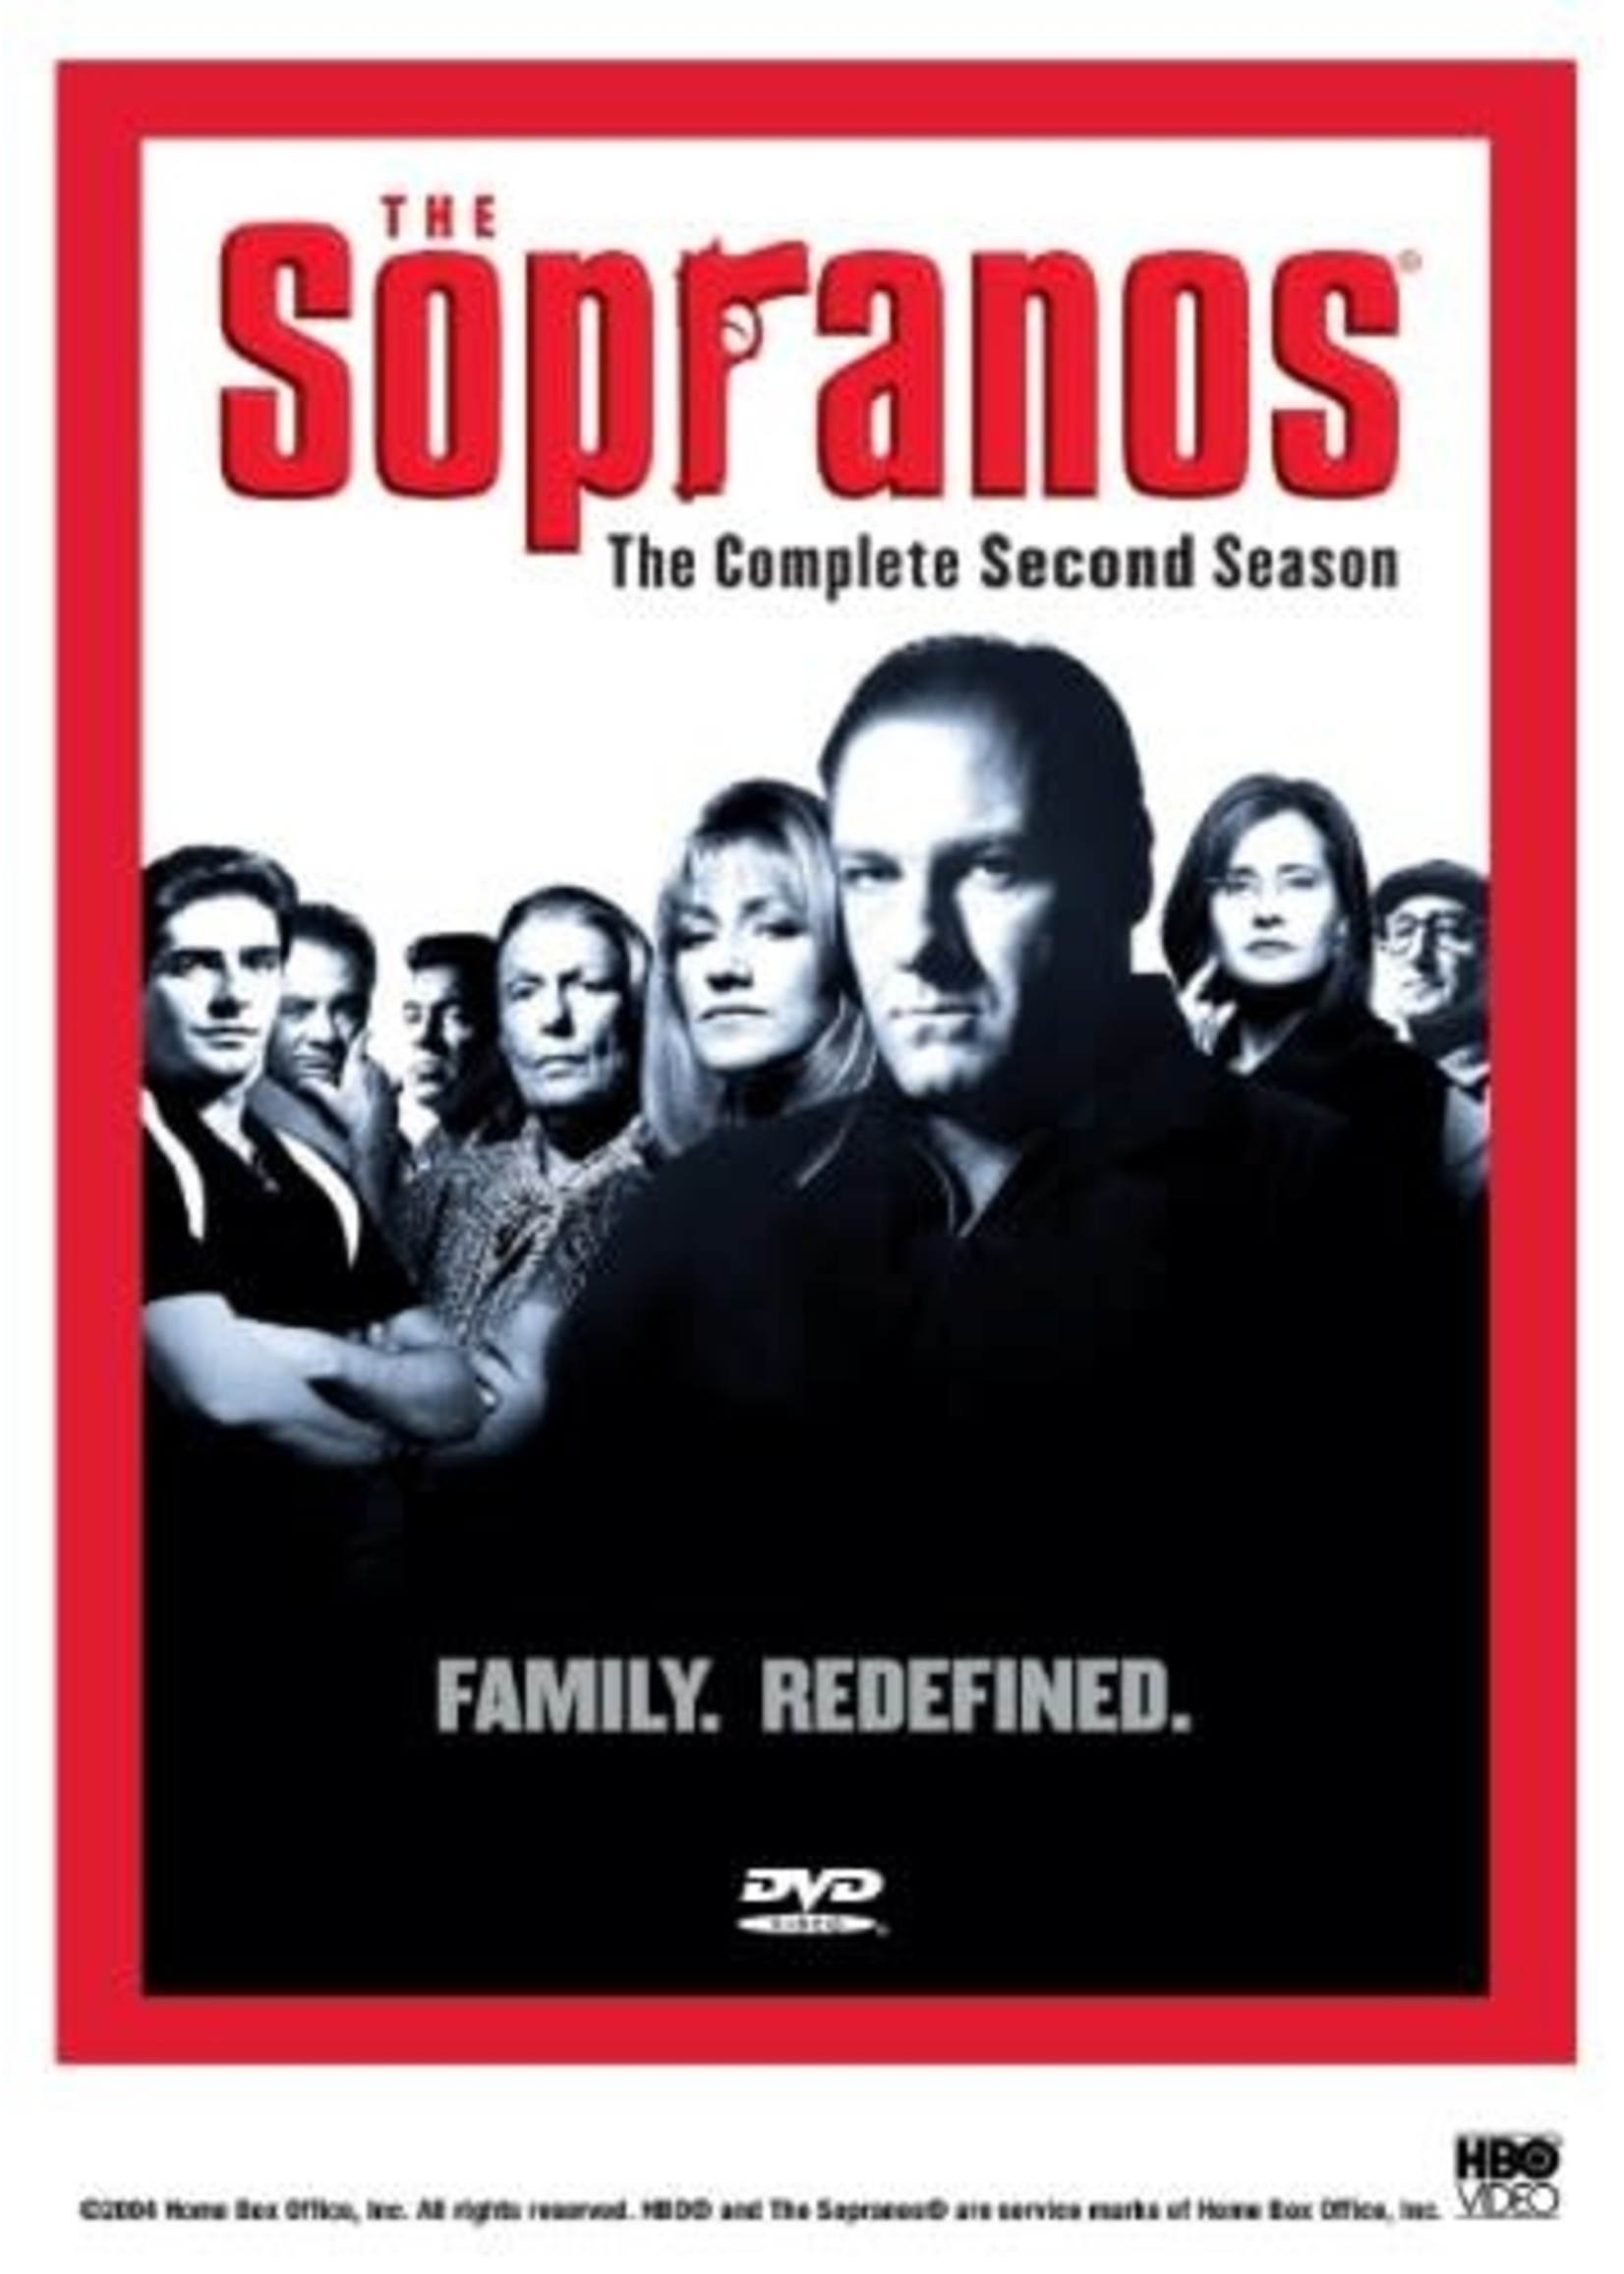 The Sopranos Complete Second Season DVD